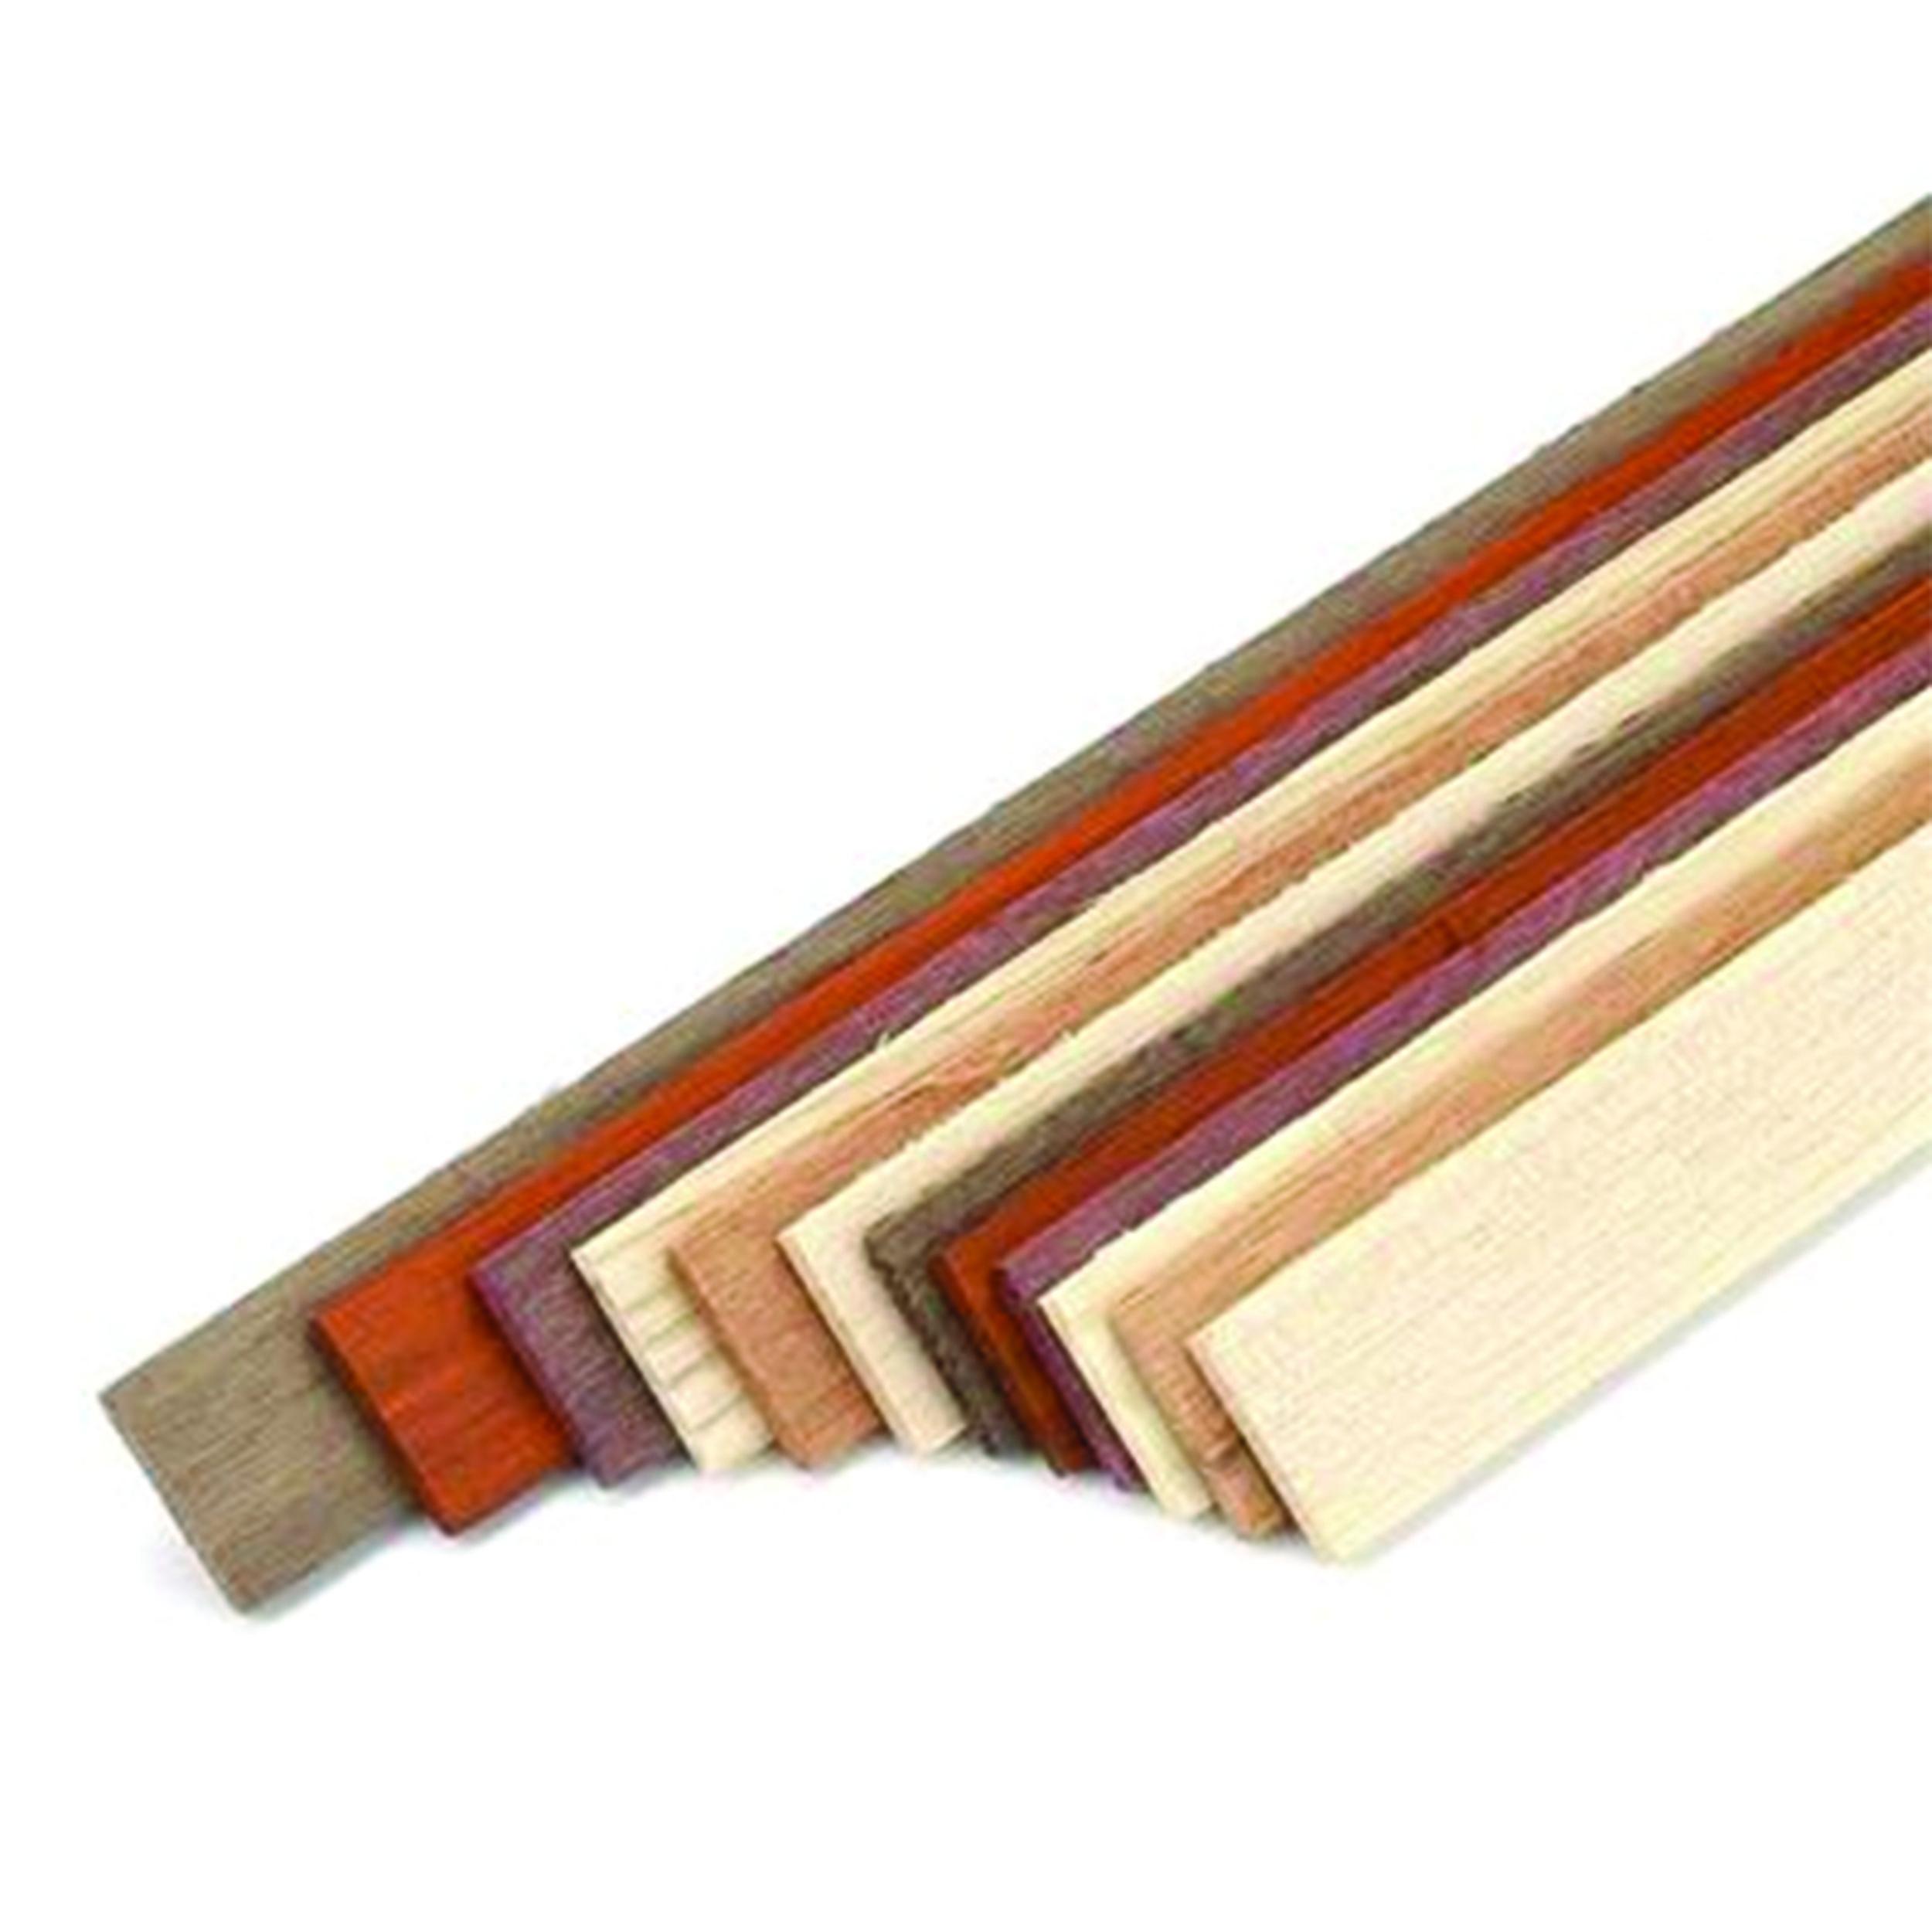 Woodcraft Woodshop Assorted Species 1 8 X 7 8 X 24 Wood Laminating Strips 12pc Wood Wood Laminate Wood Shop